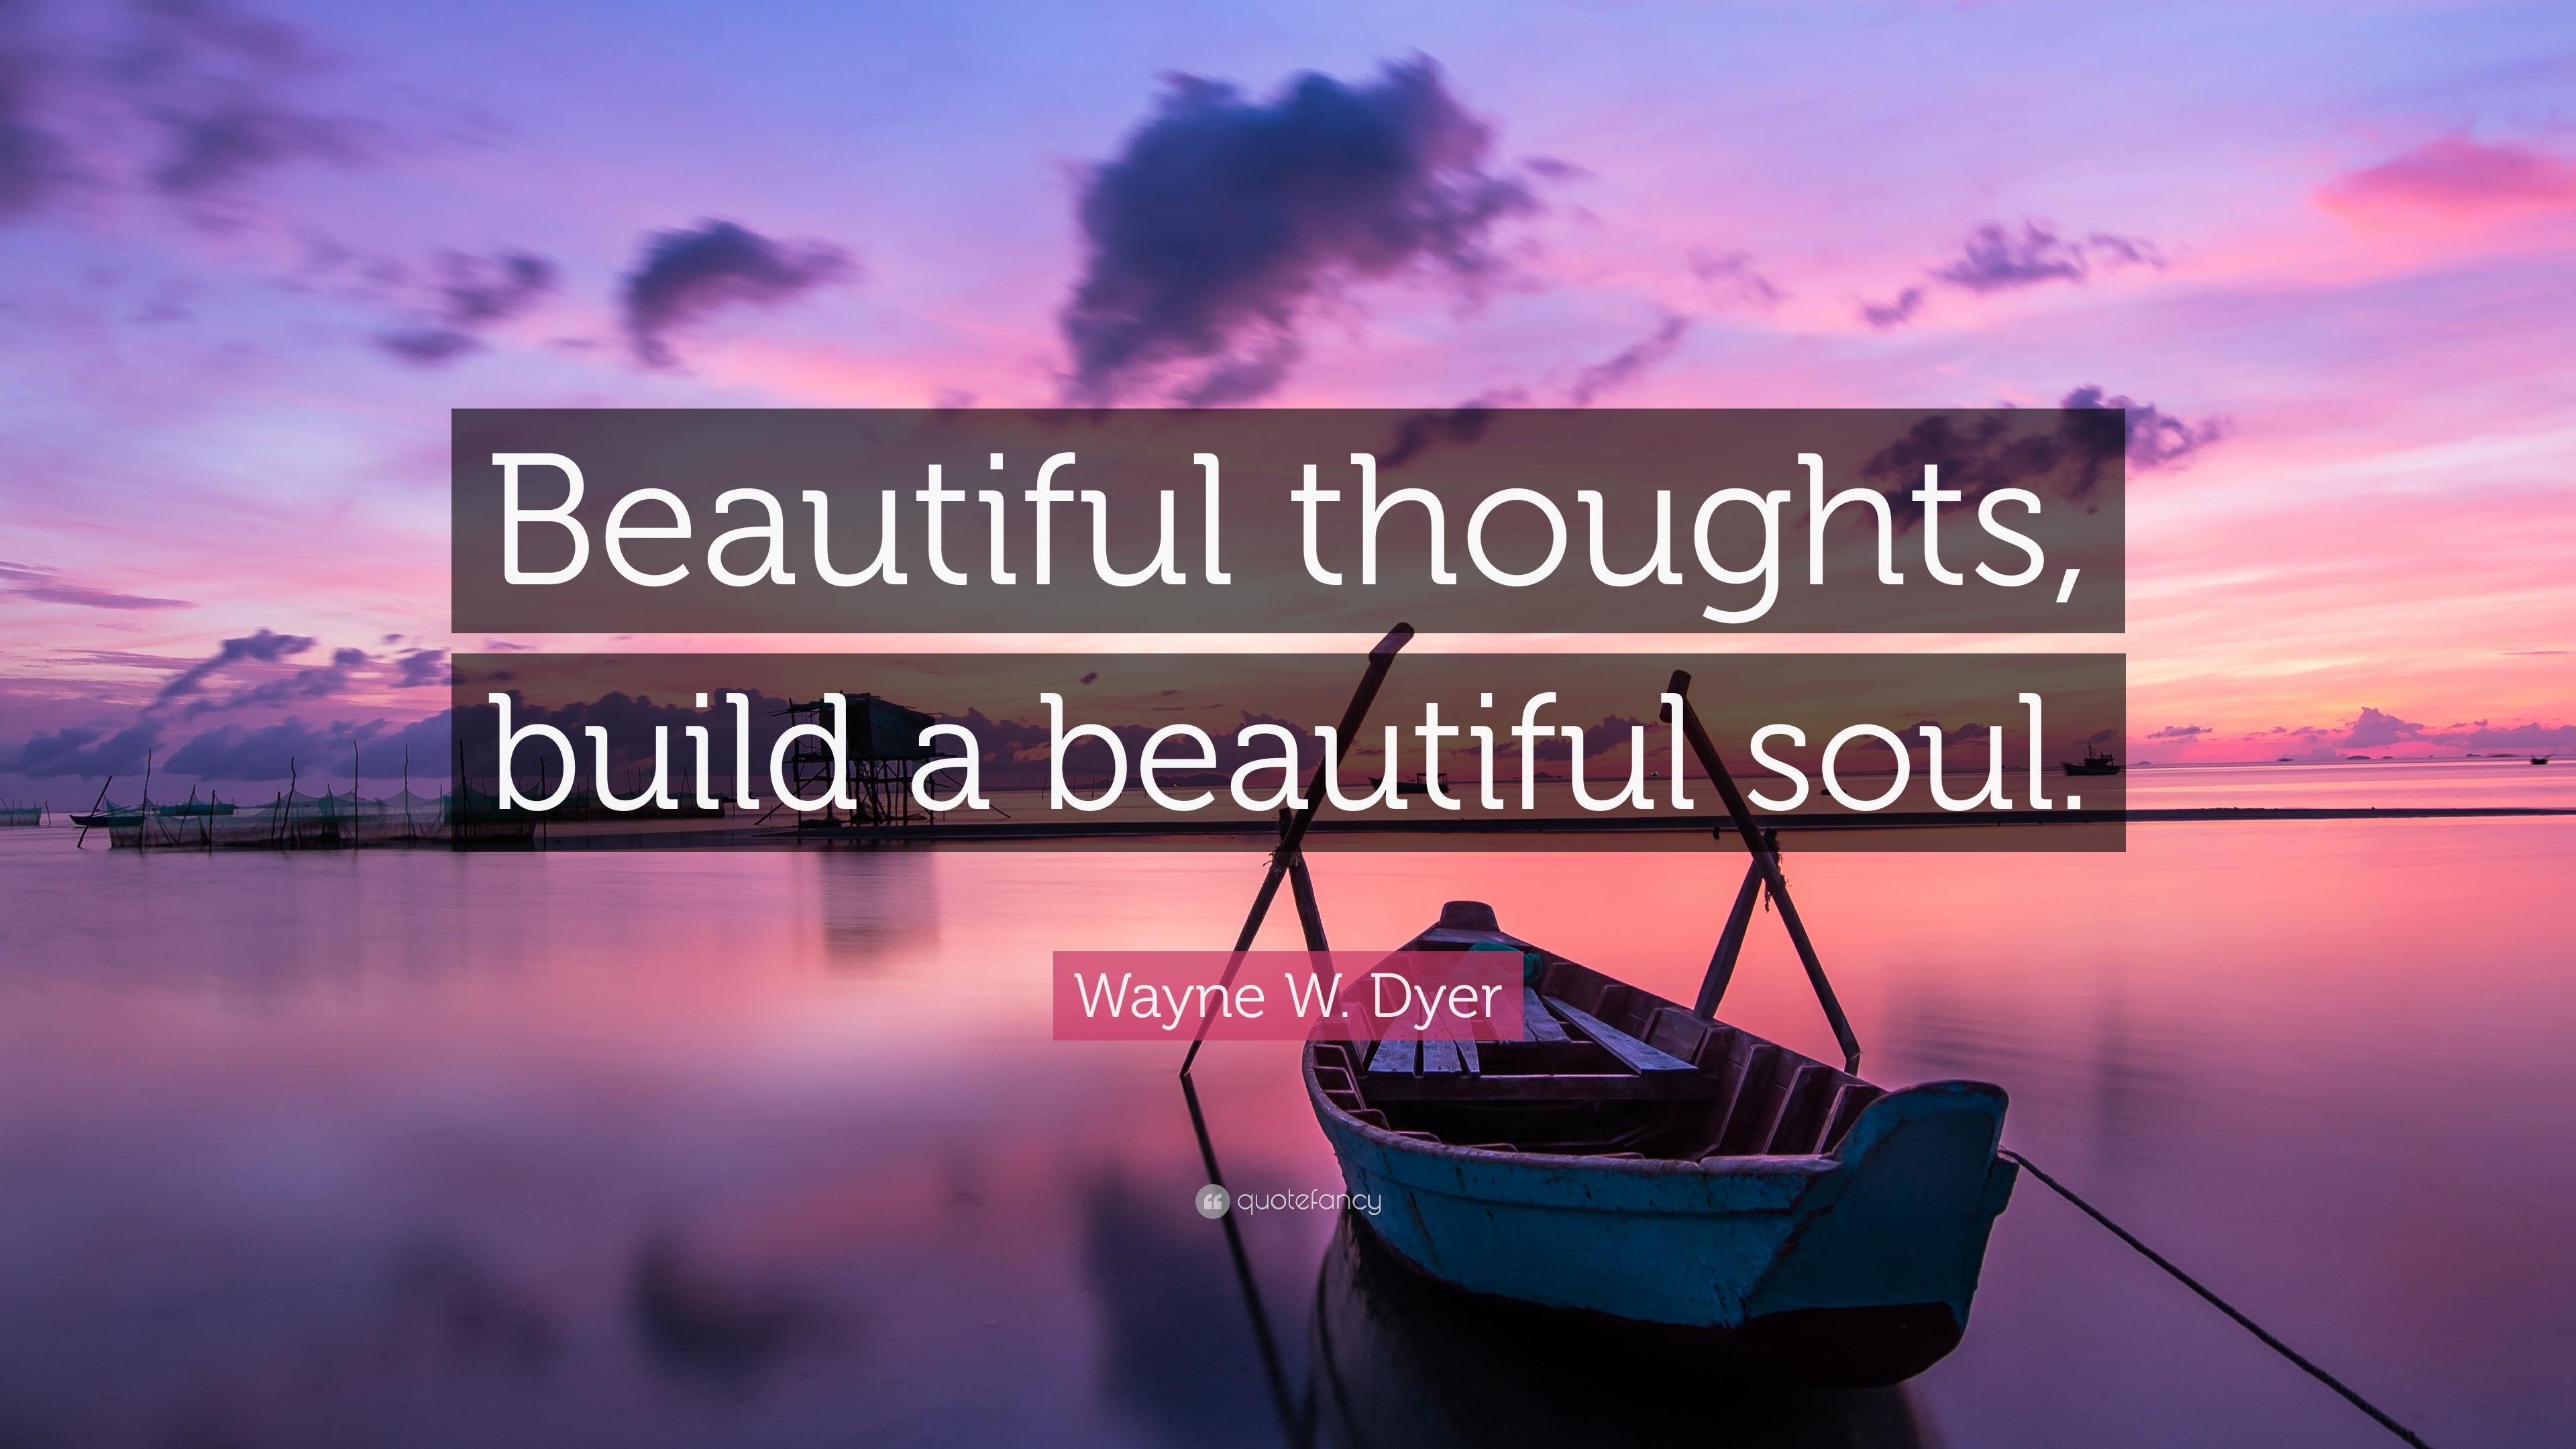 beautiful beautiful wallpaper,sky,text,water transportation,morning,calm